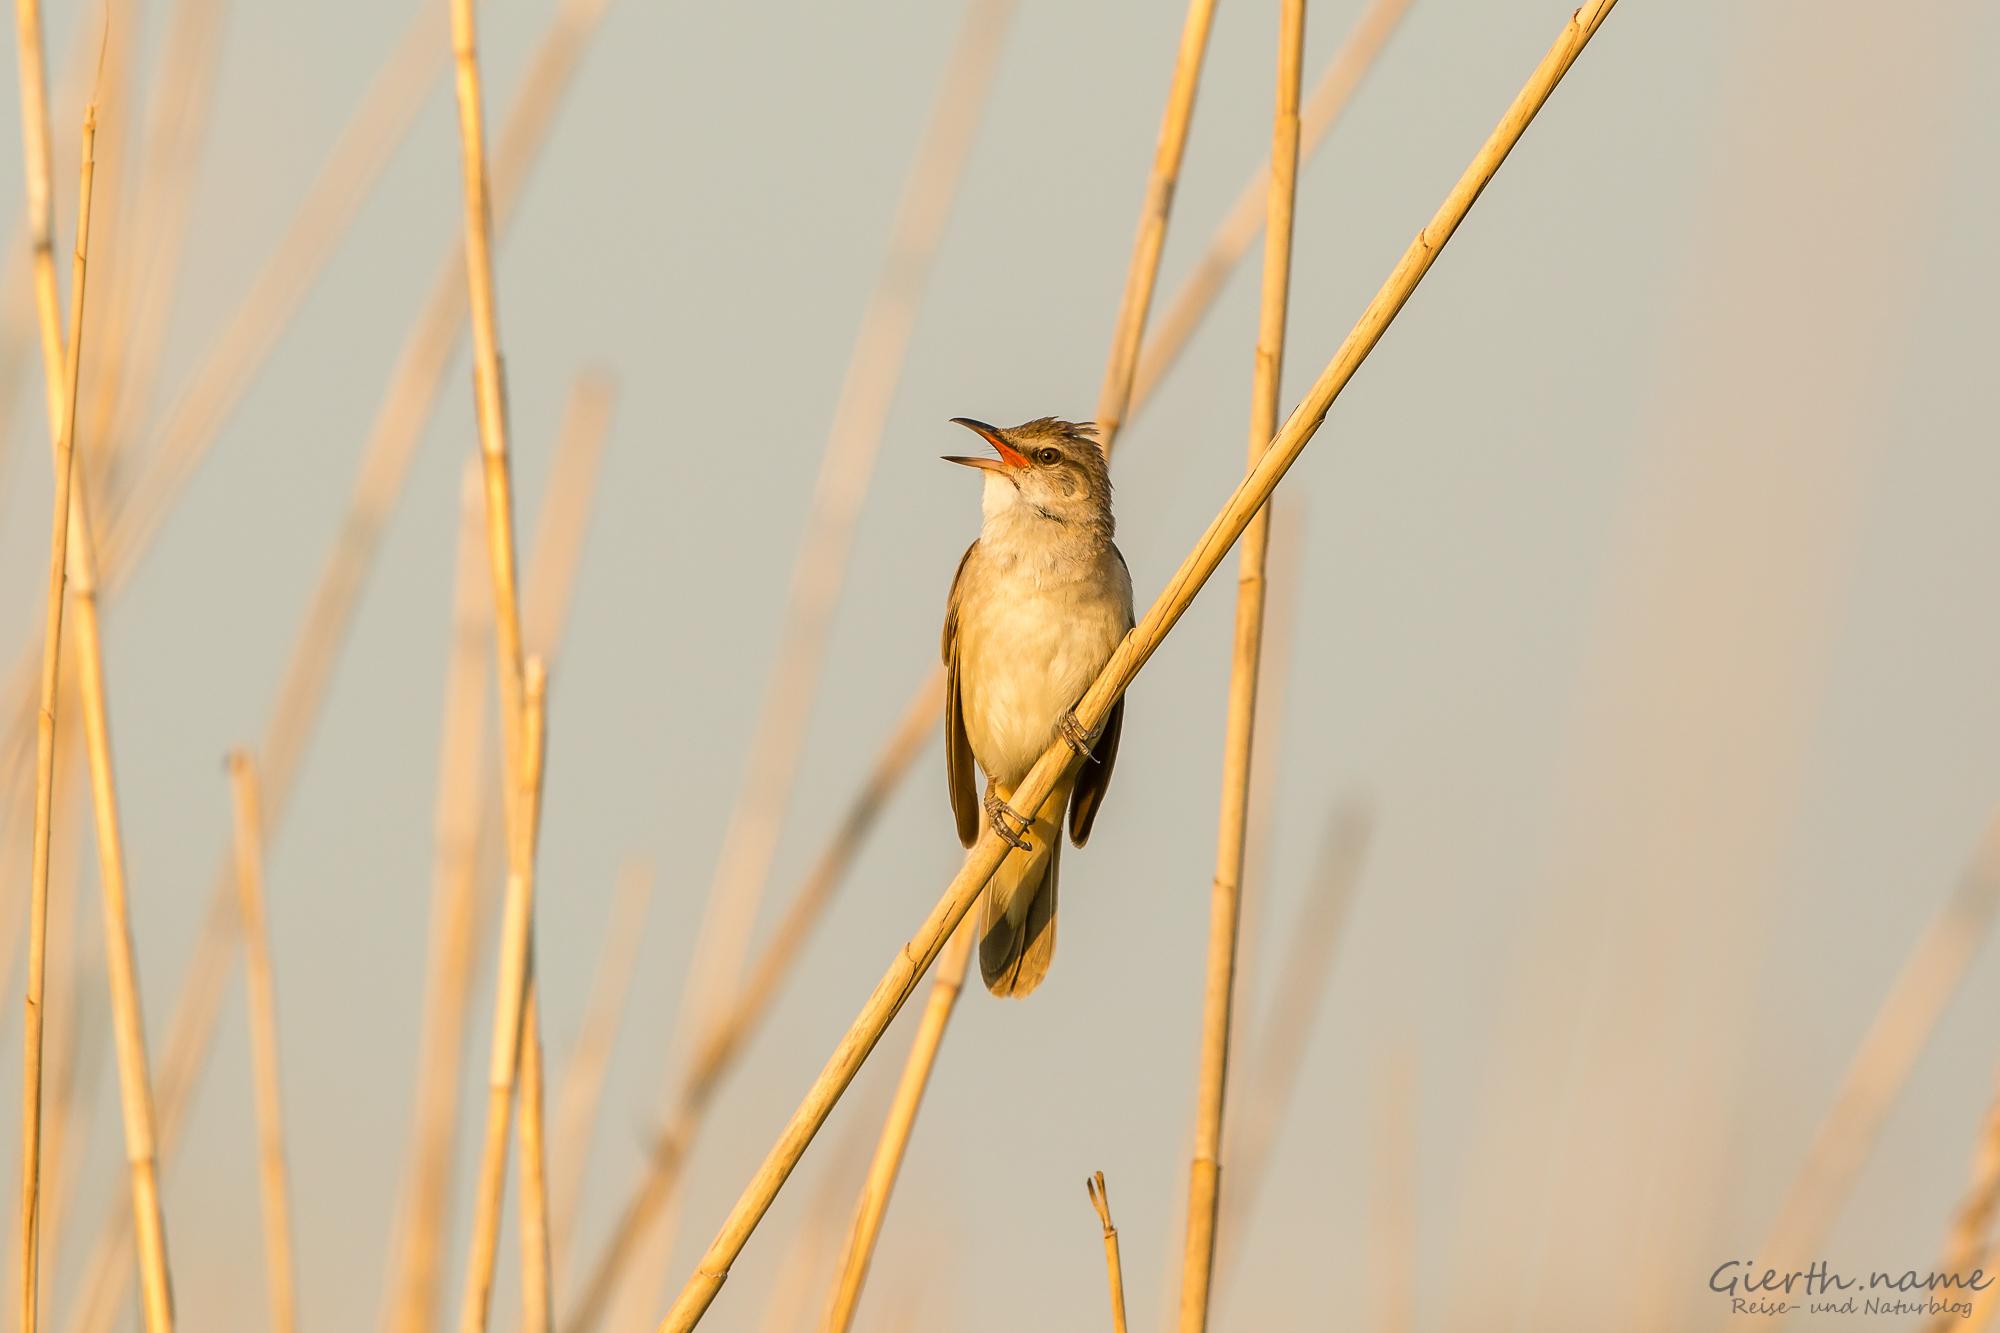 Drosselrohrsänger - Great Reed-Warbler - Acrocephalus arundinaceus